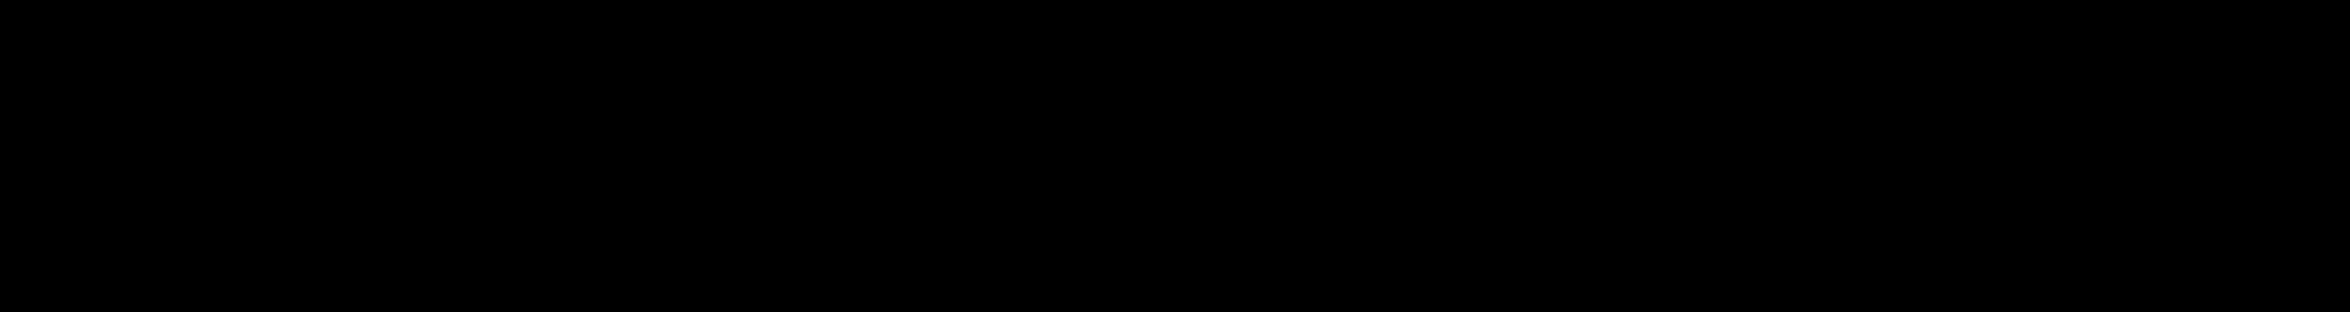 Image-Shr-alf-5